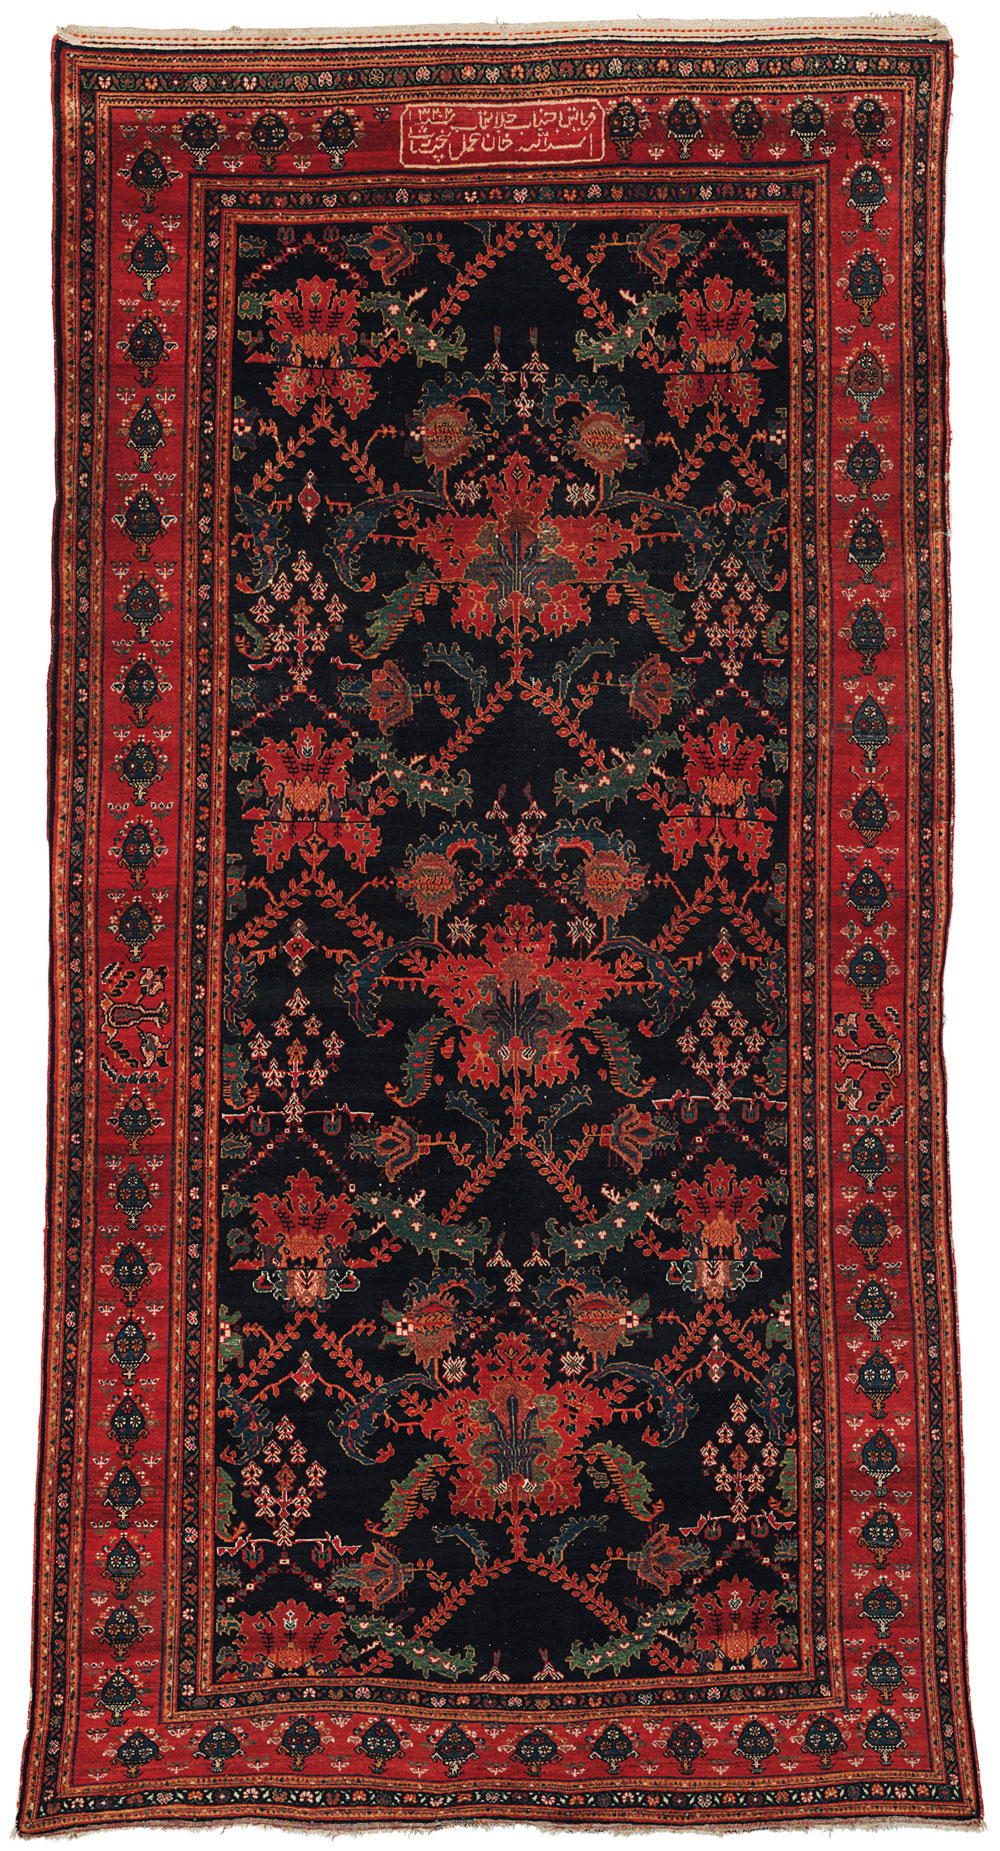 "The Opulent Eye auction, Christie's New York 18 November, Bakhtiari carpet, west Persia, dated 1904-1905 AD/AH 1322, 409cm x 206cm (13'5"" x 6'9""), estimate $8,000 - 12,000"